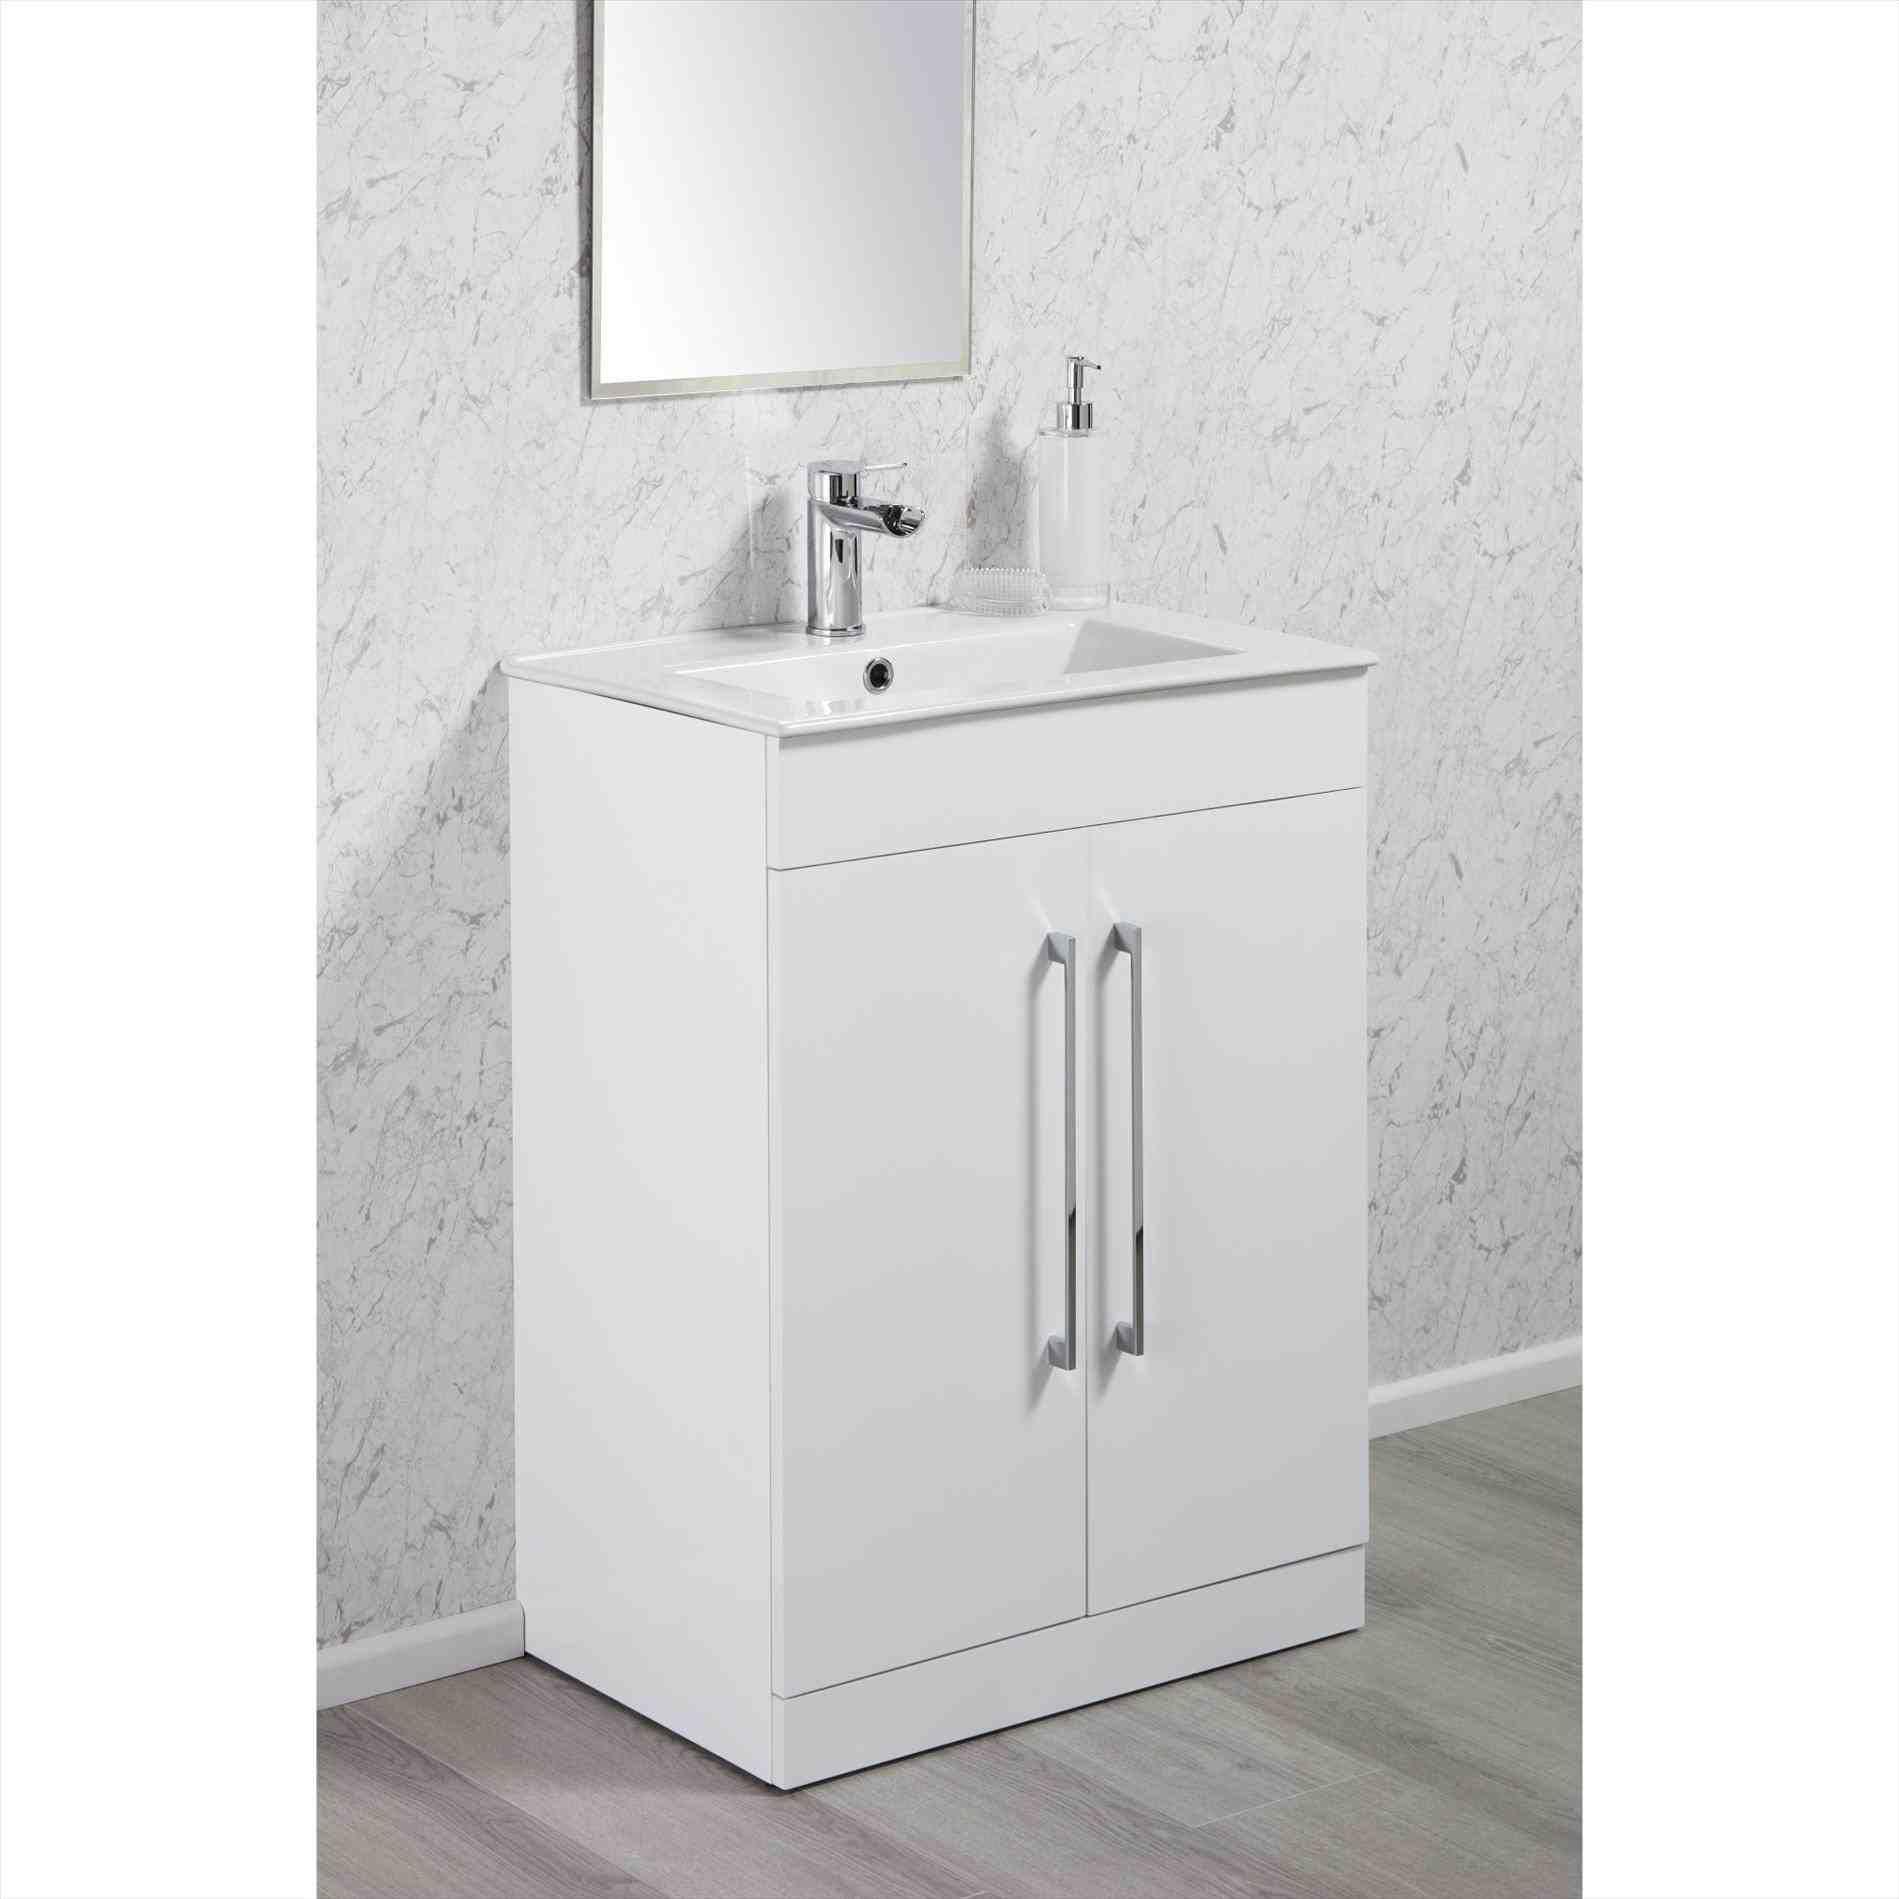 New Post bathroom accessories on sale visit bathroomremodelideass ...